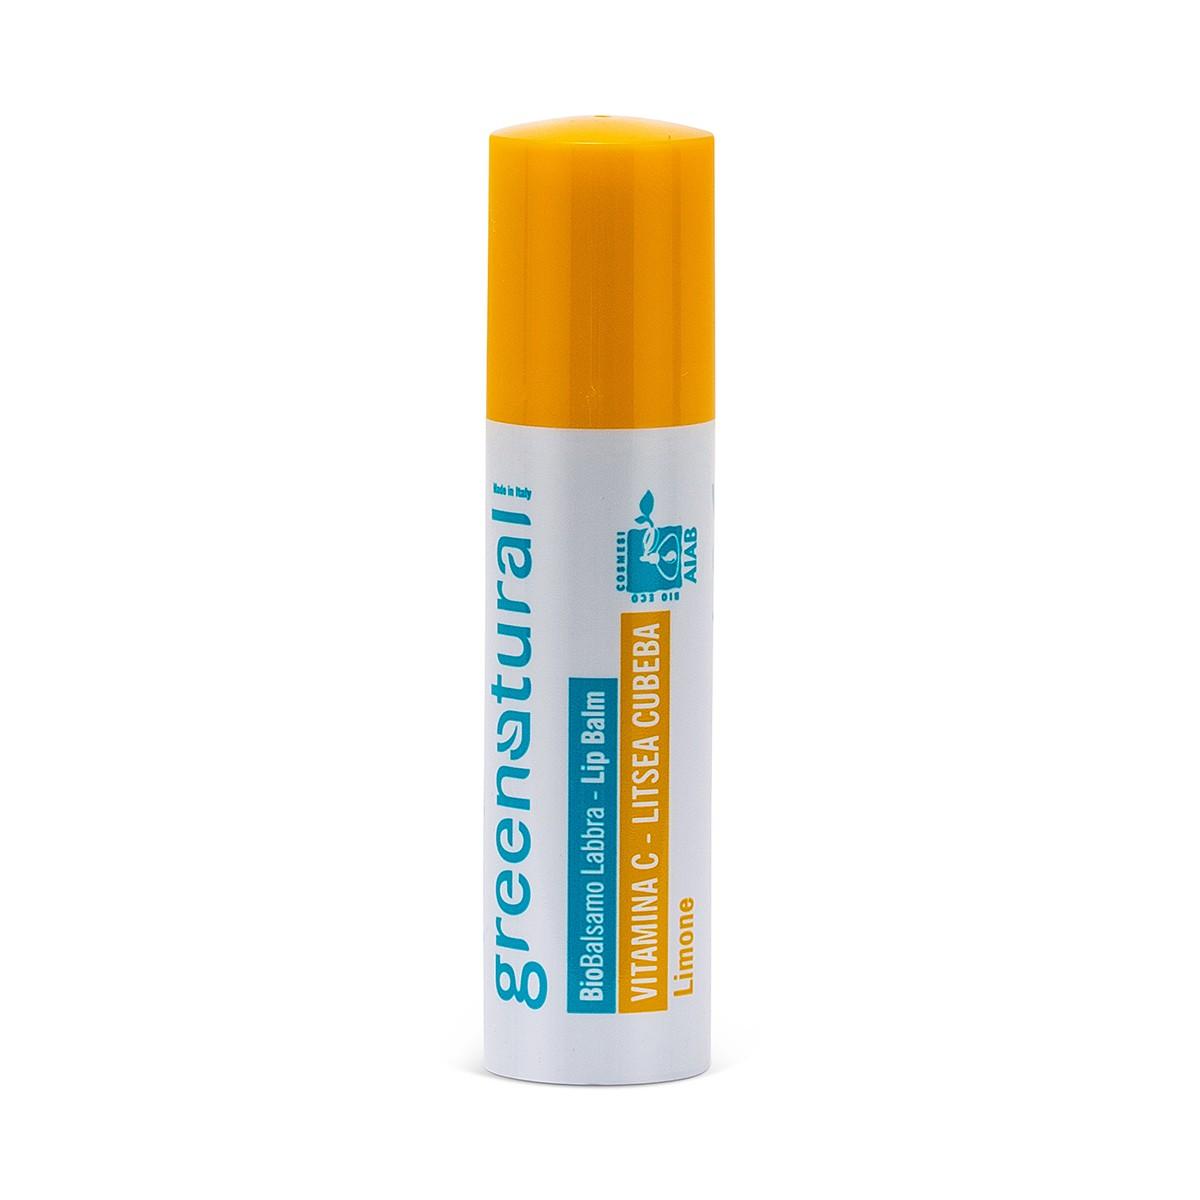 Balsamo Labbra Stick Alla Vitamina C – Giovinezza